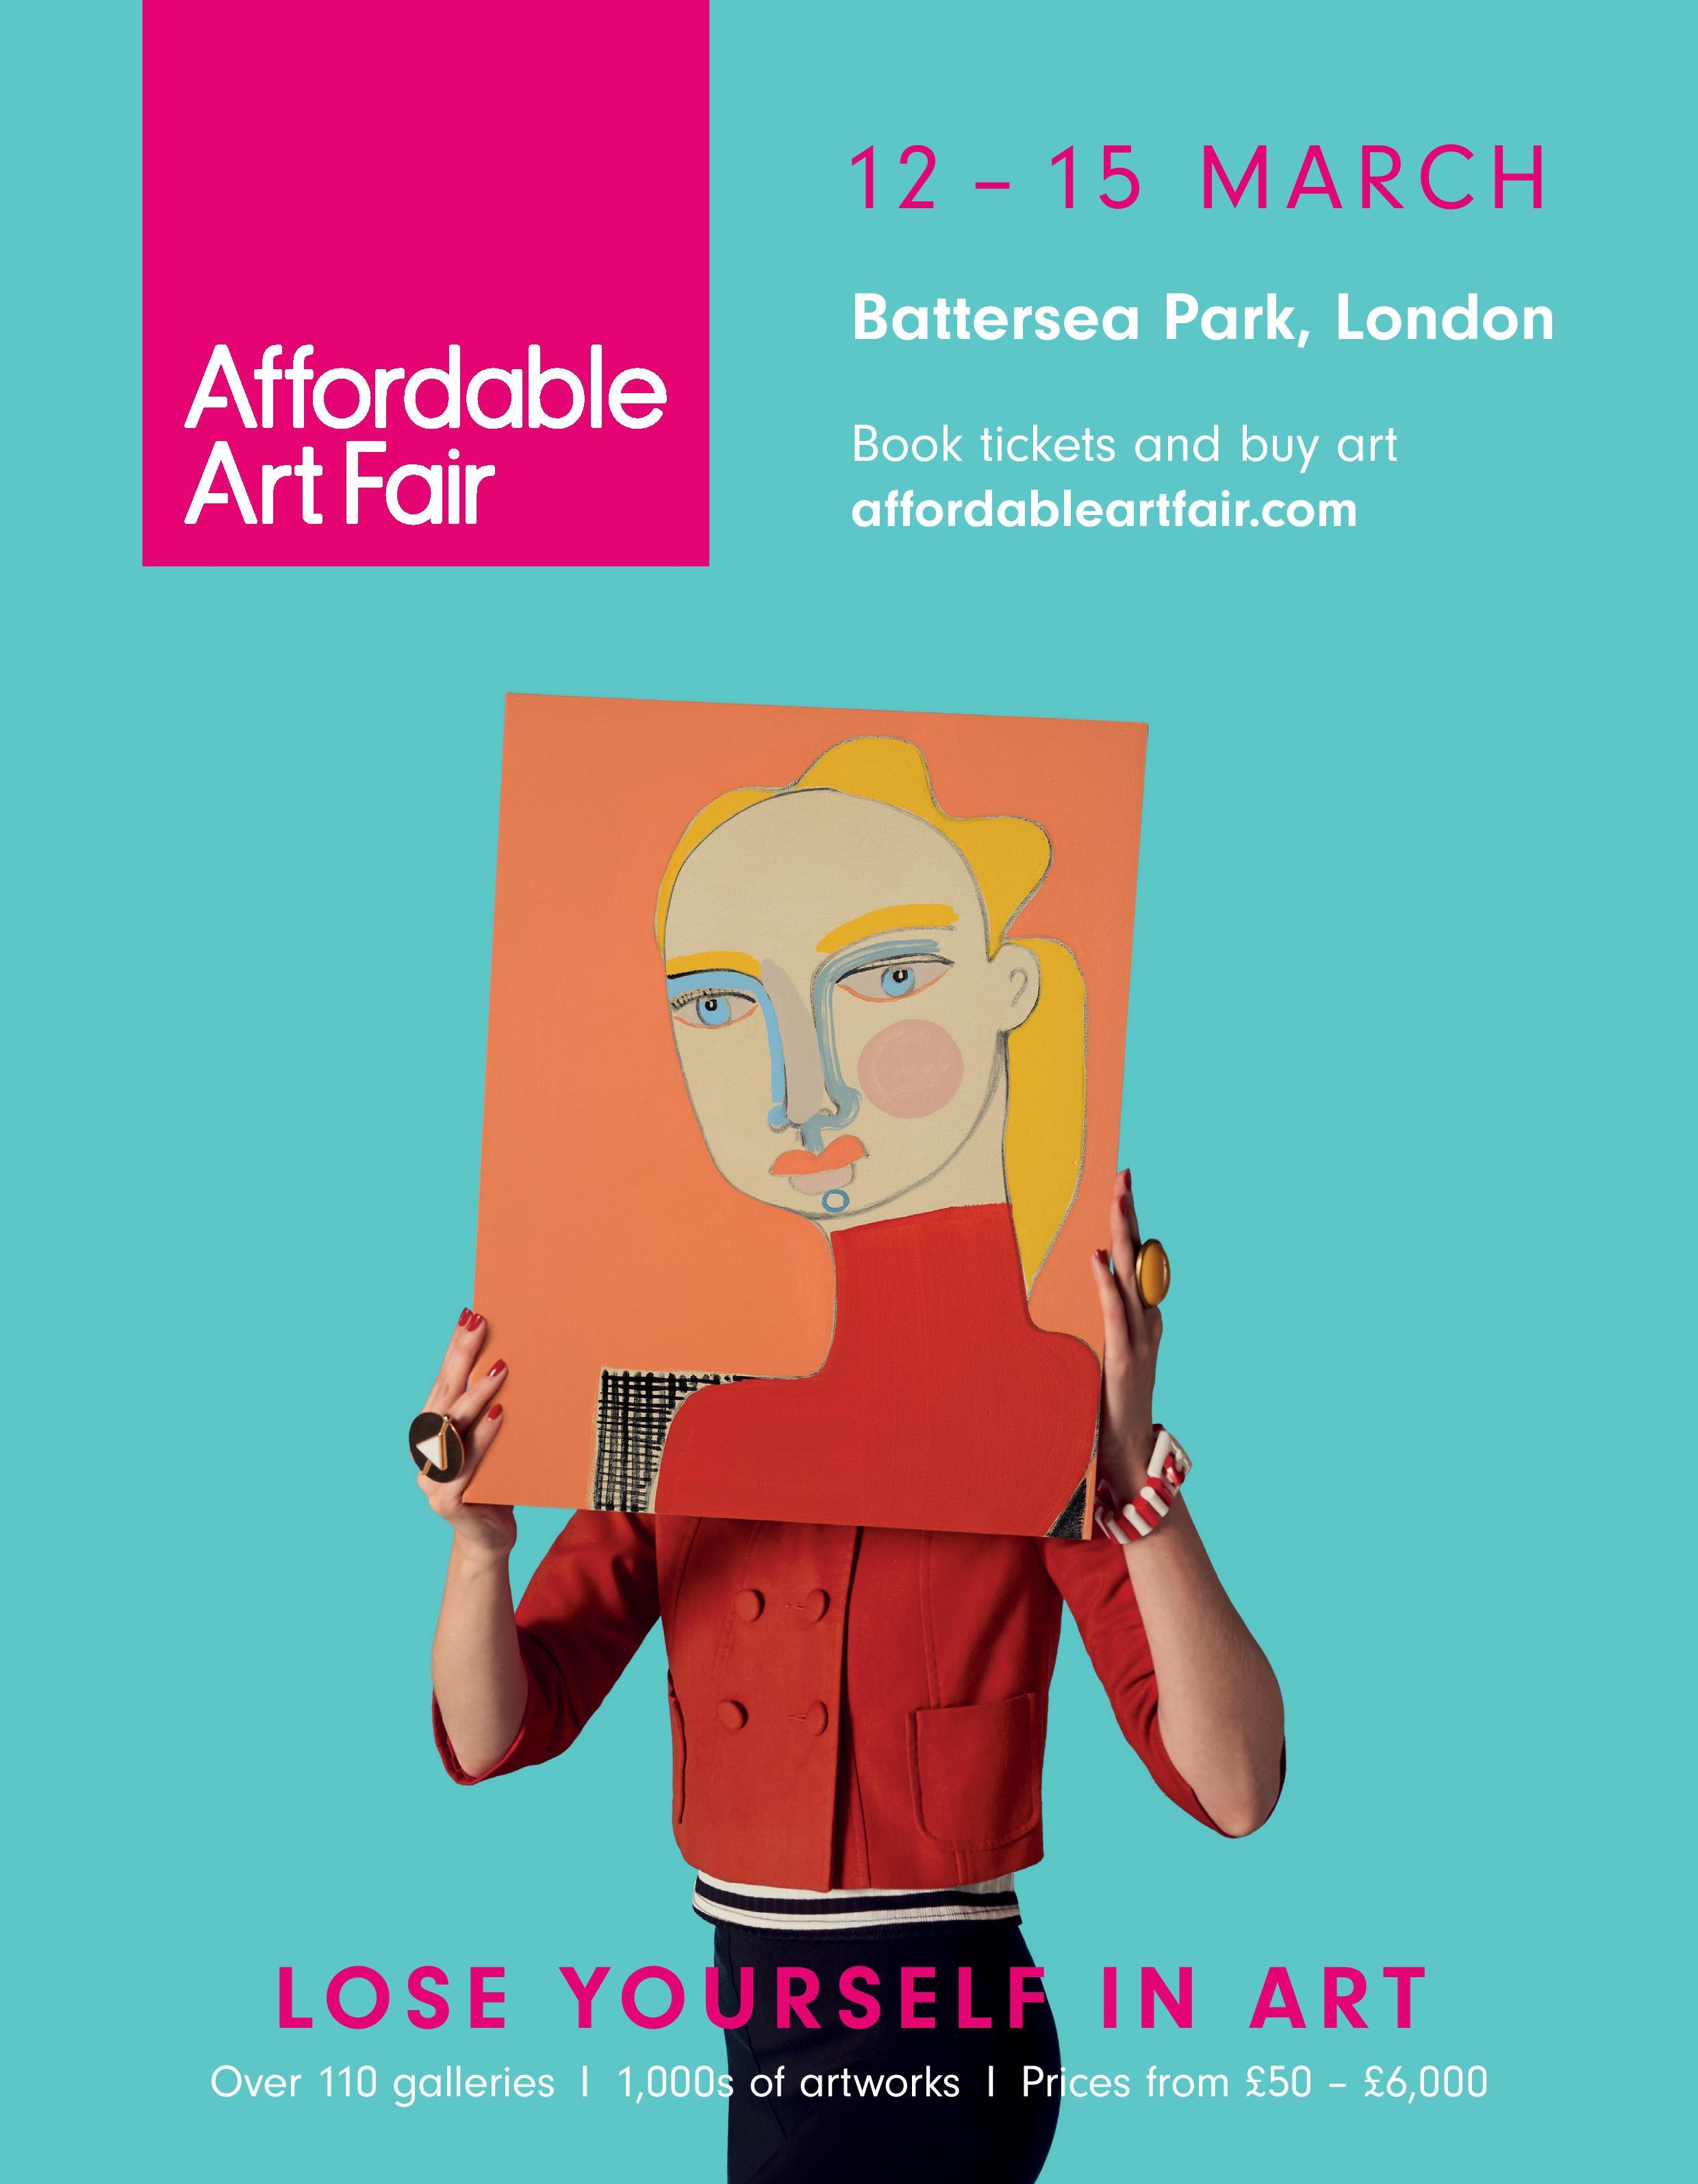 Affordable Art Fair New York fall, camapign image